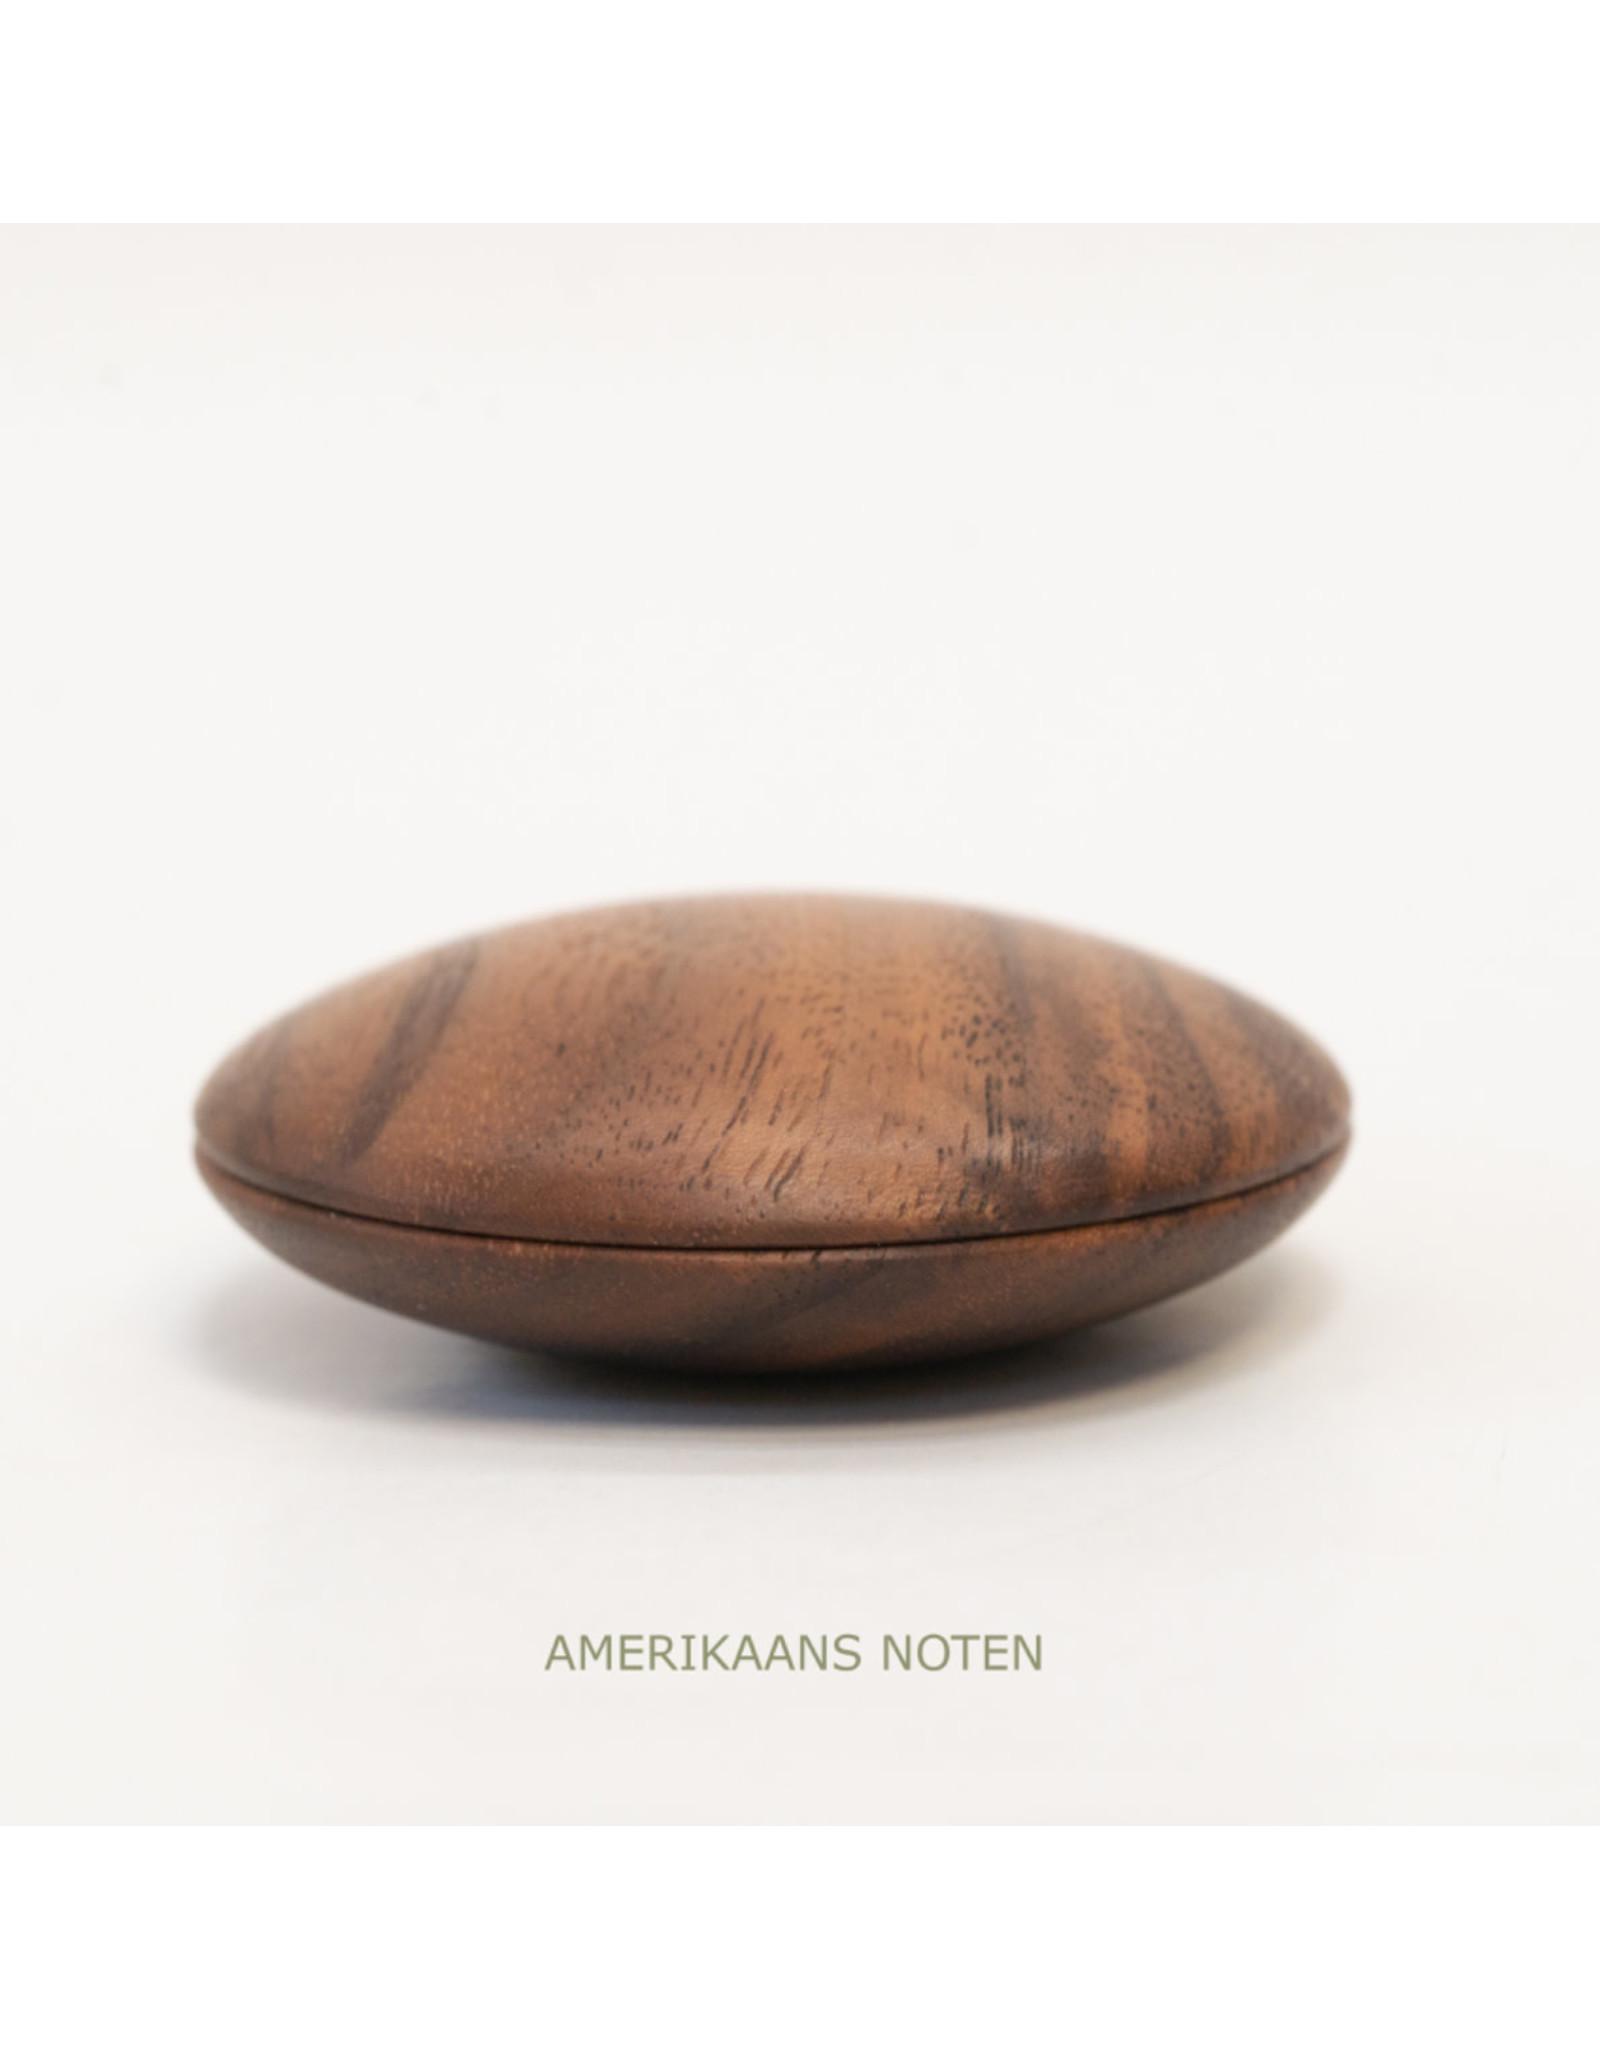 Suzan Doornbos Troosthout | Amerikaans Notenhout | 5 x 5 x 3 cm